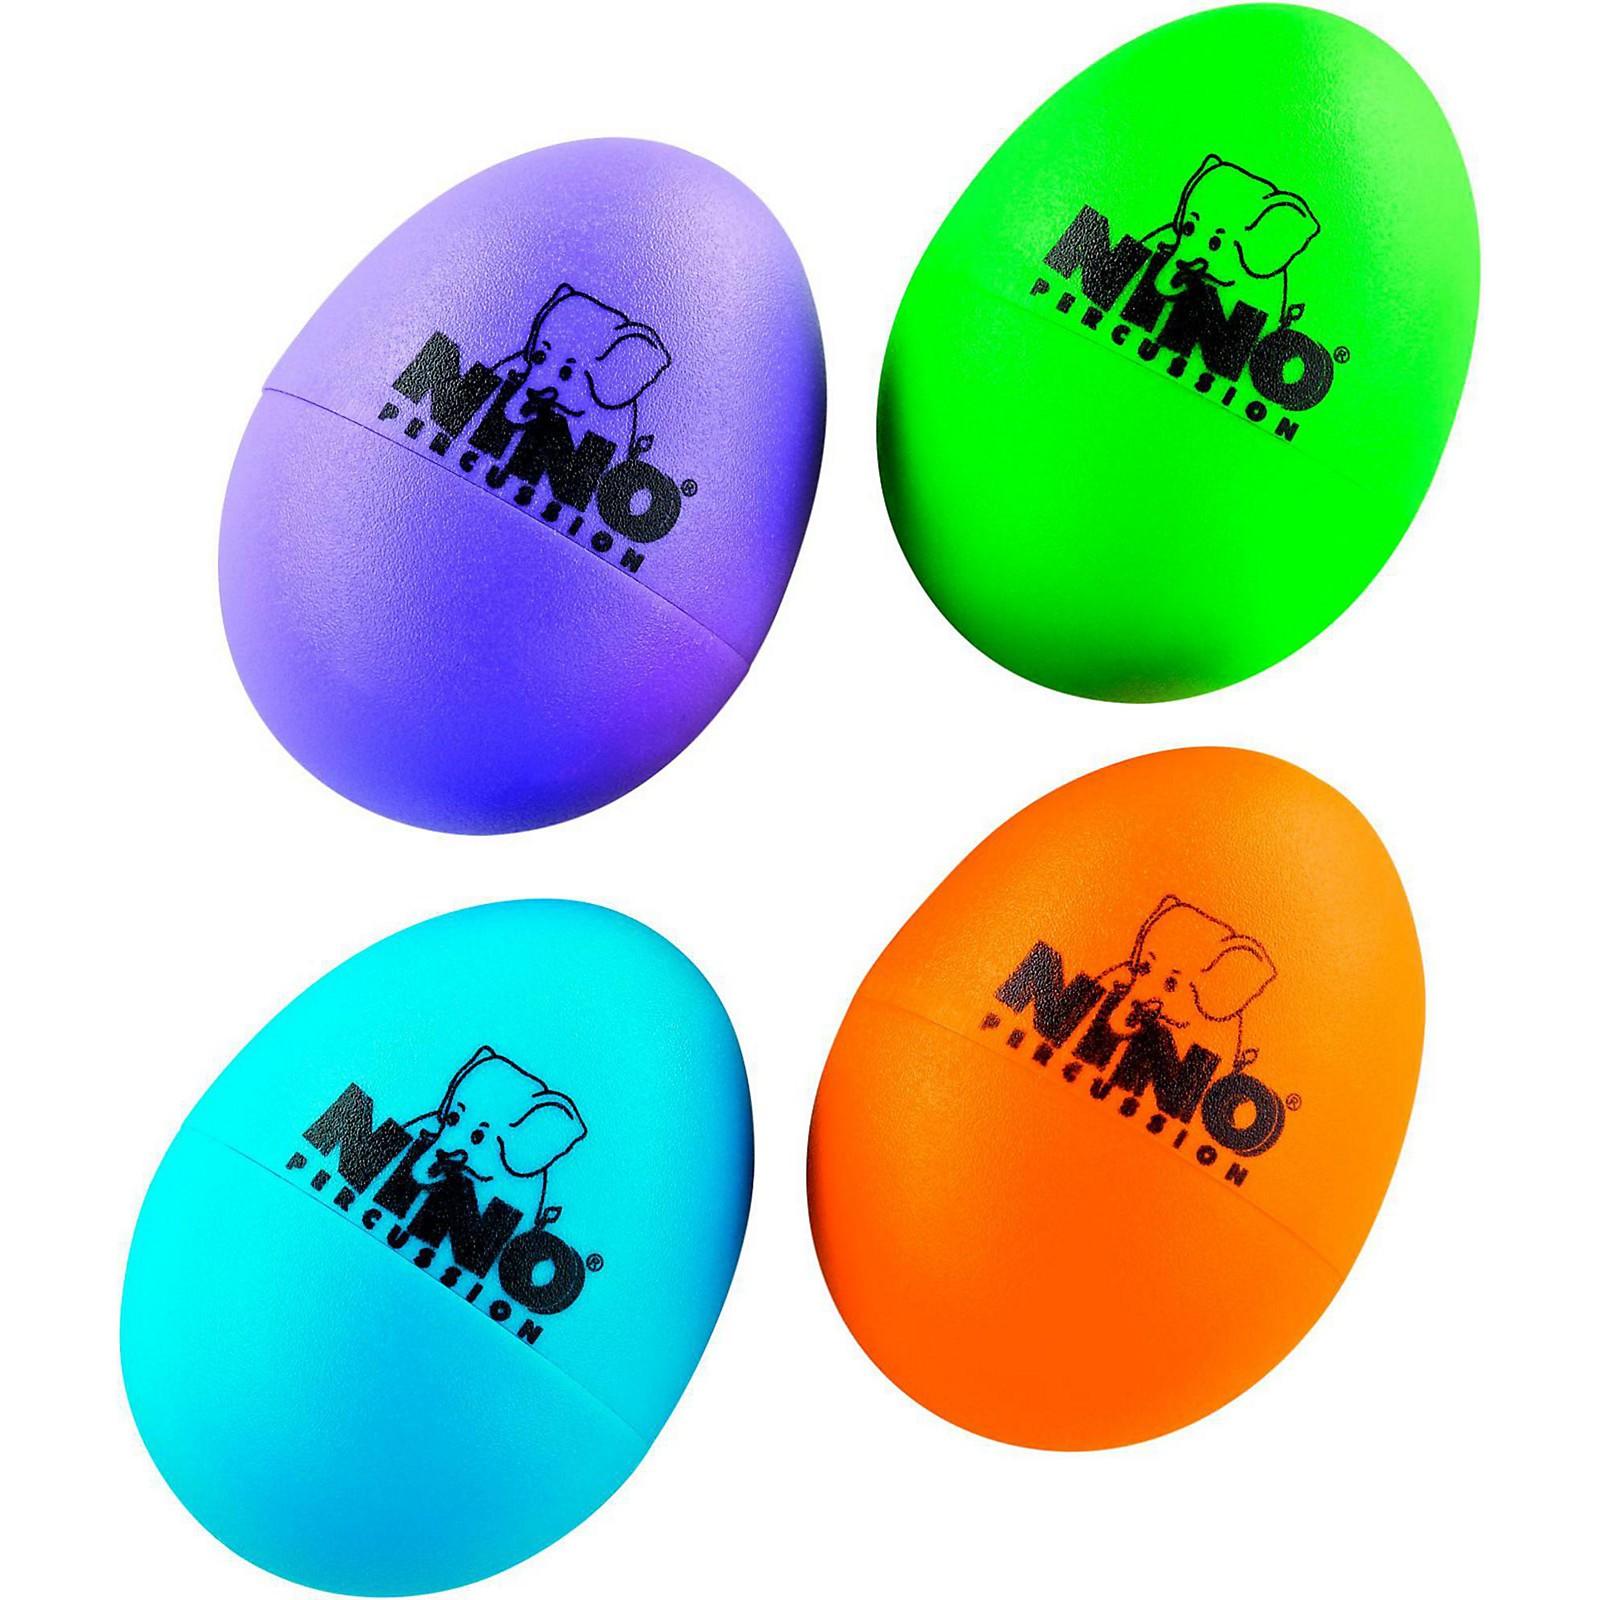 Nino Plastic Egg Shaker 4 Piece Assortment